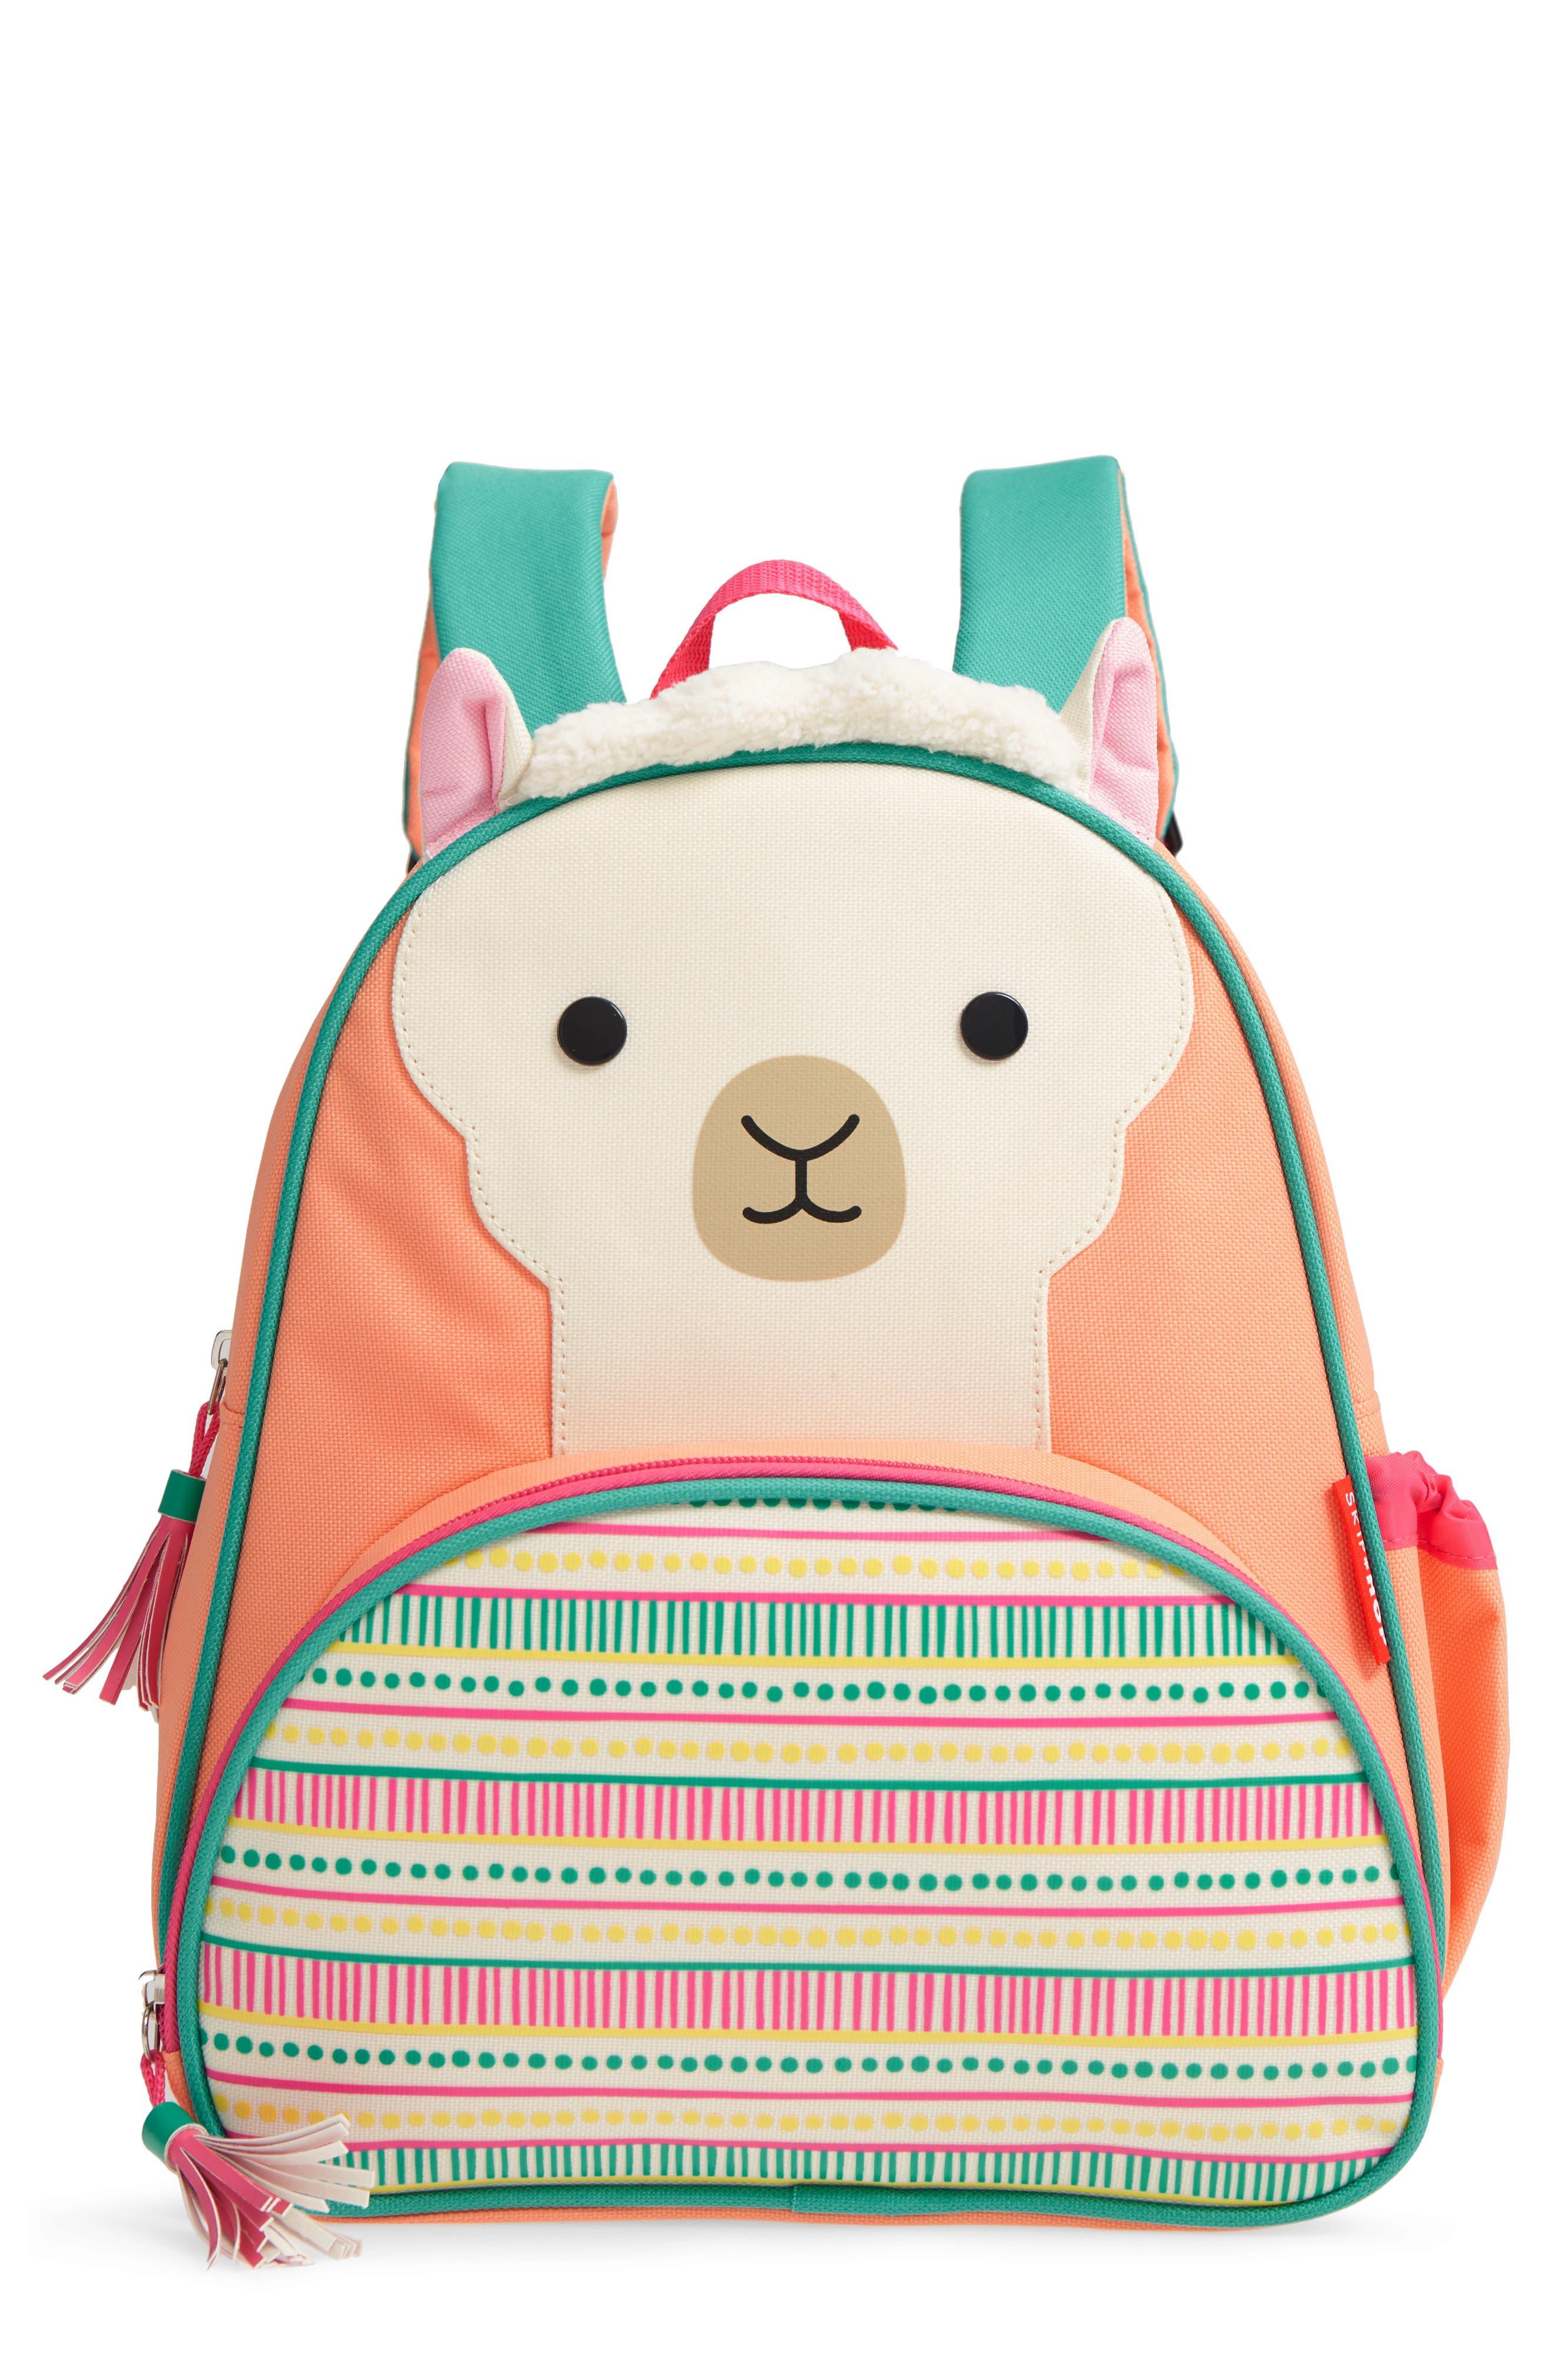 SKIP HOP, Zoo Pack Llama Backpack, Main thumbnail 1, color, PINK MULTI